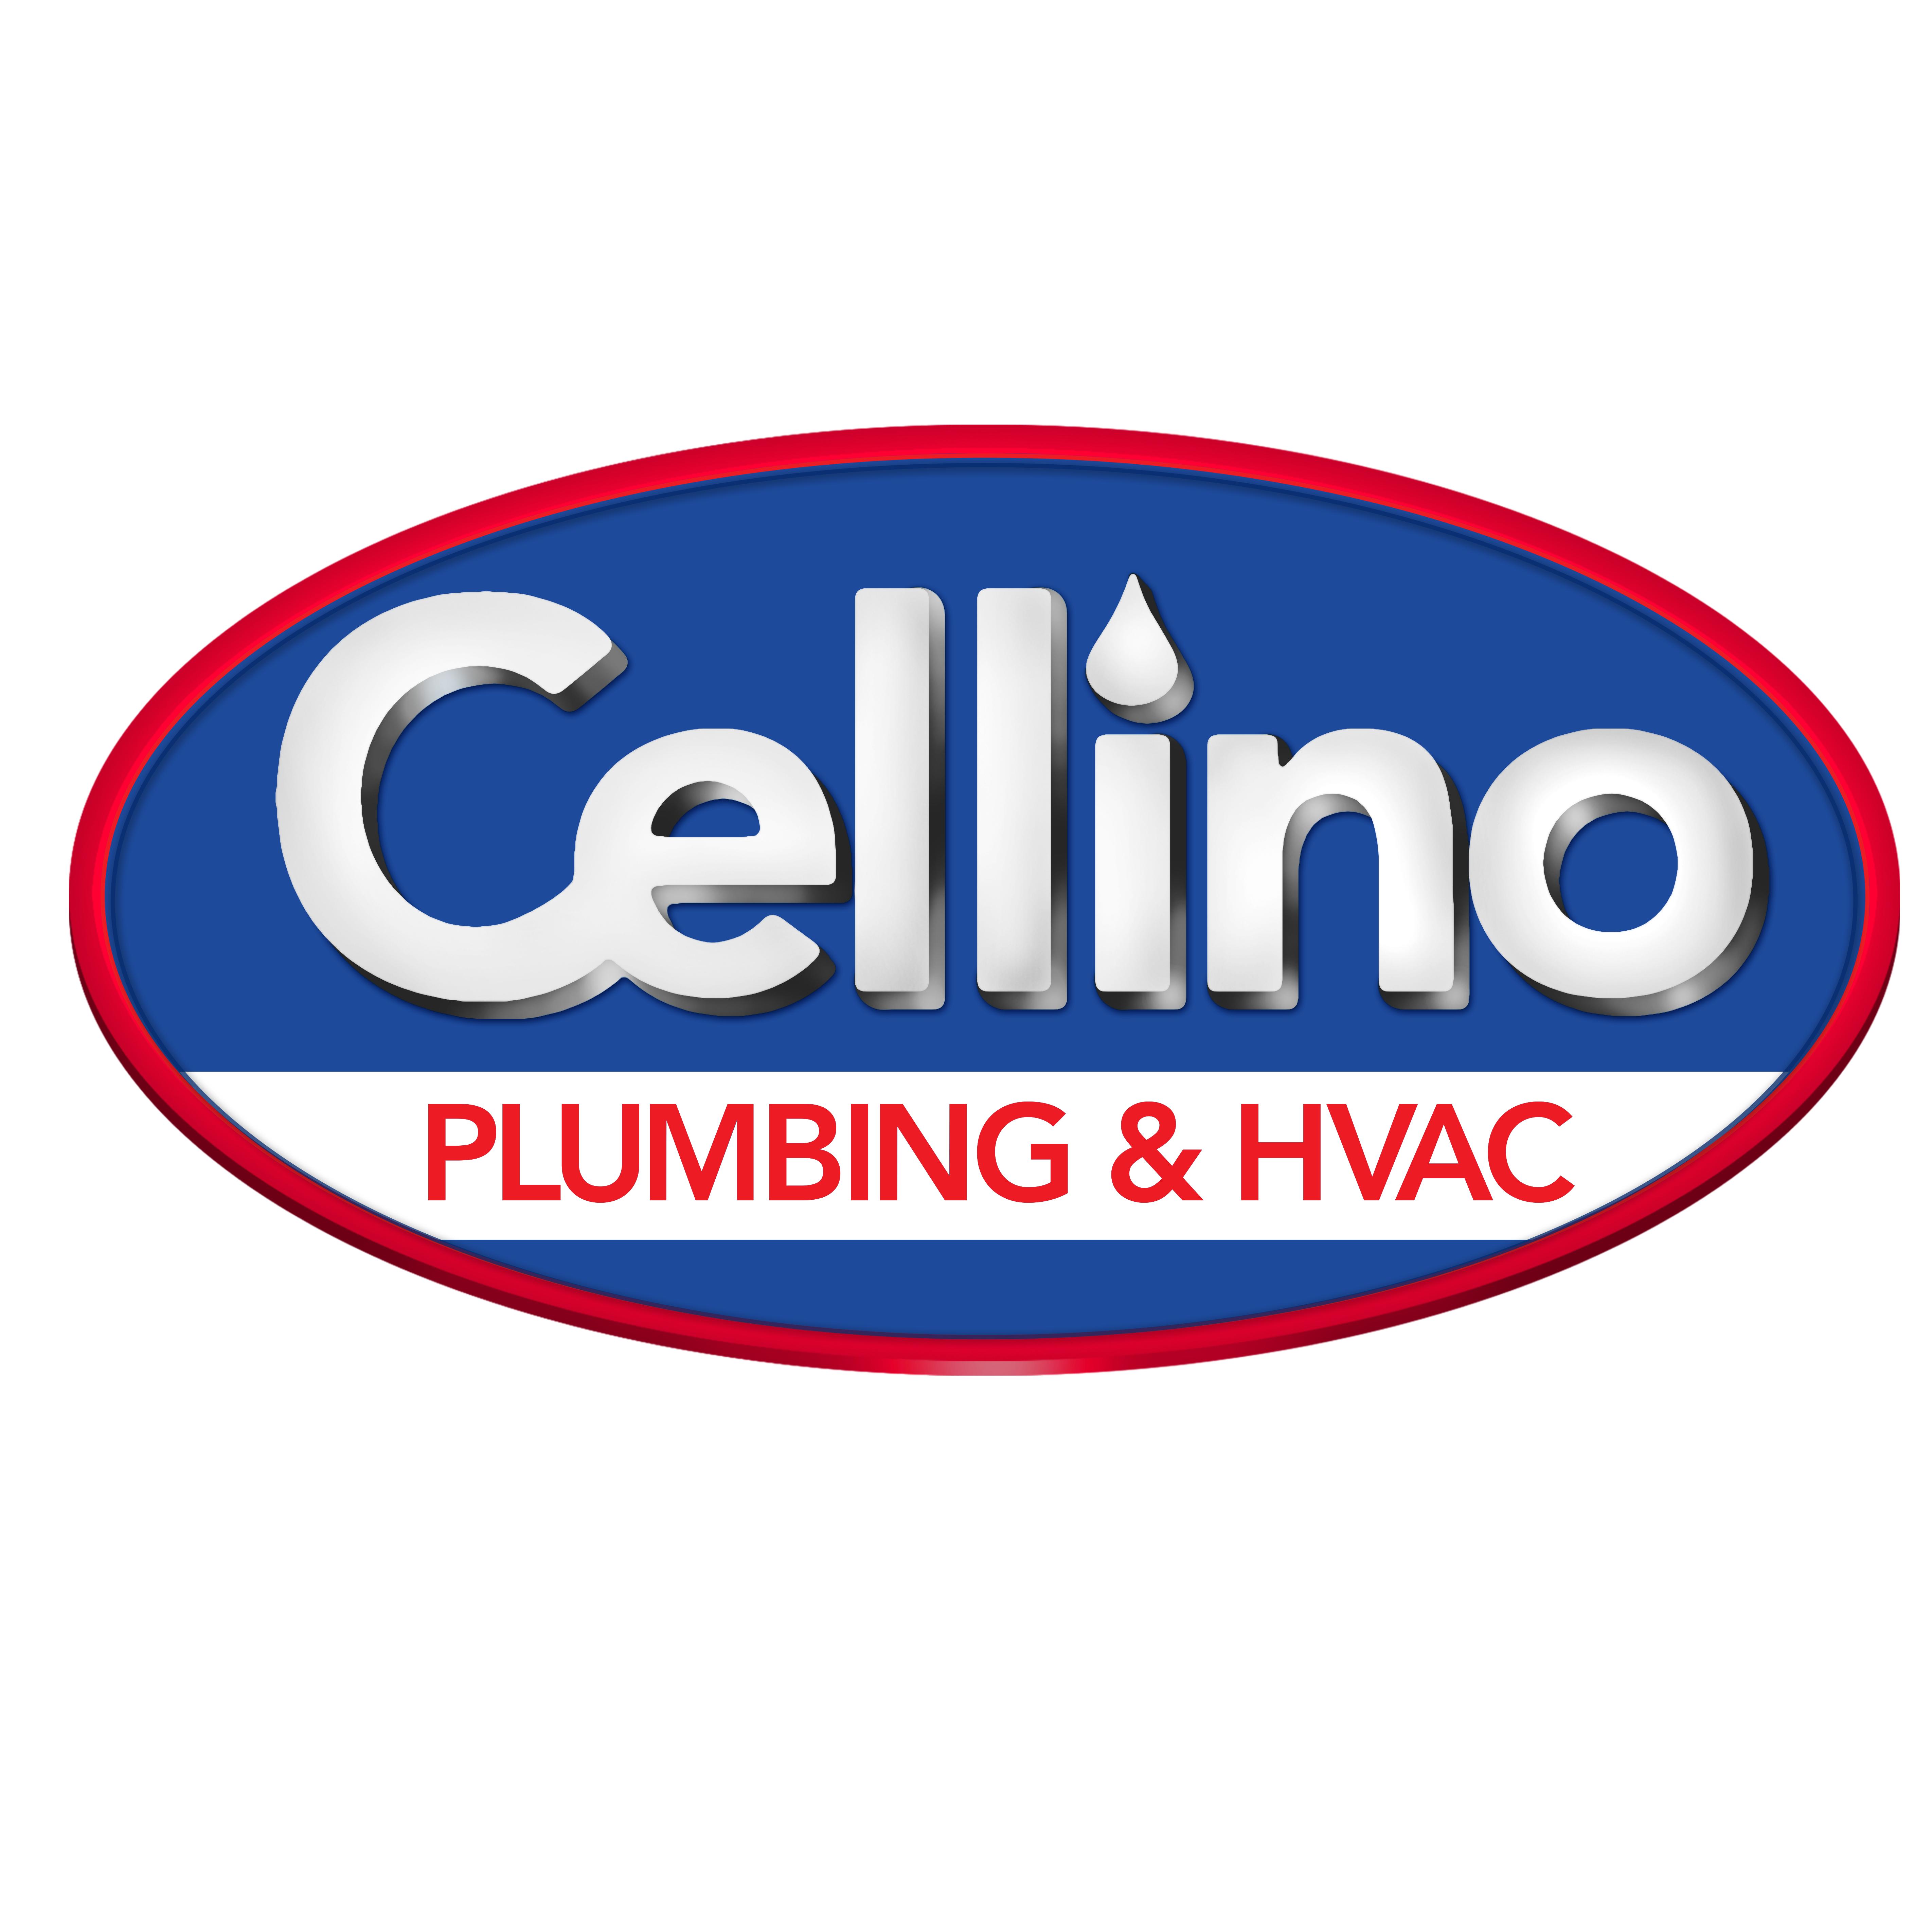 Cellino Plumbing, Heating & Cooling